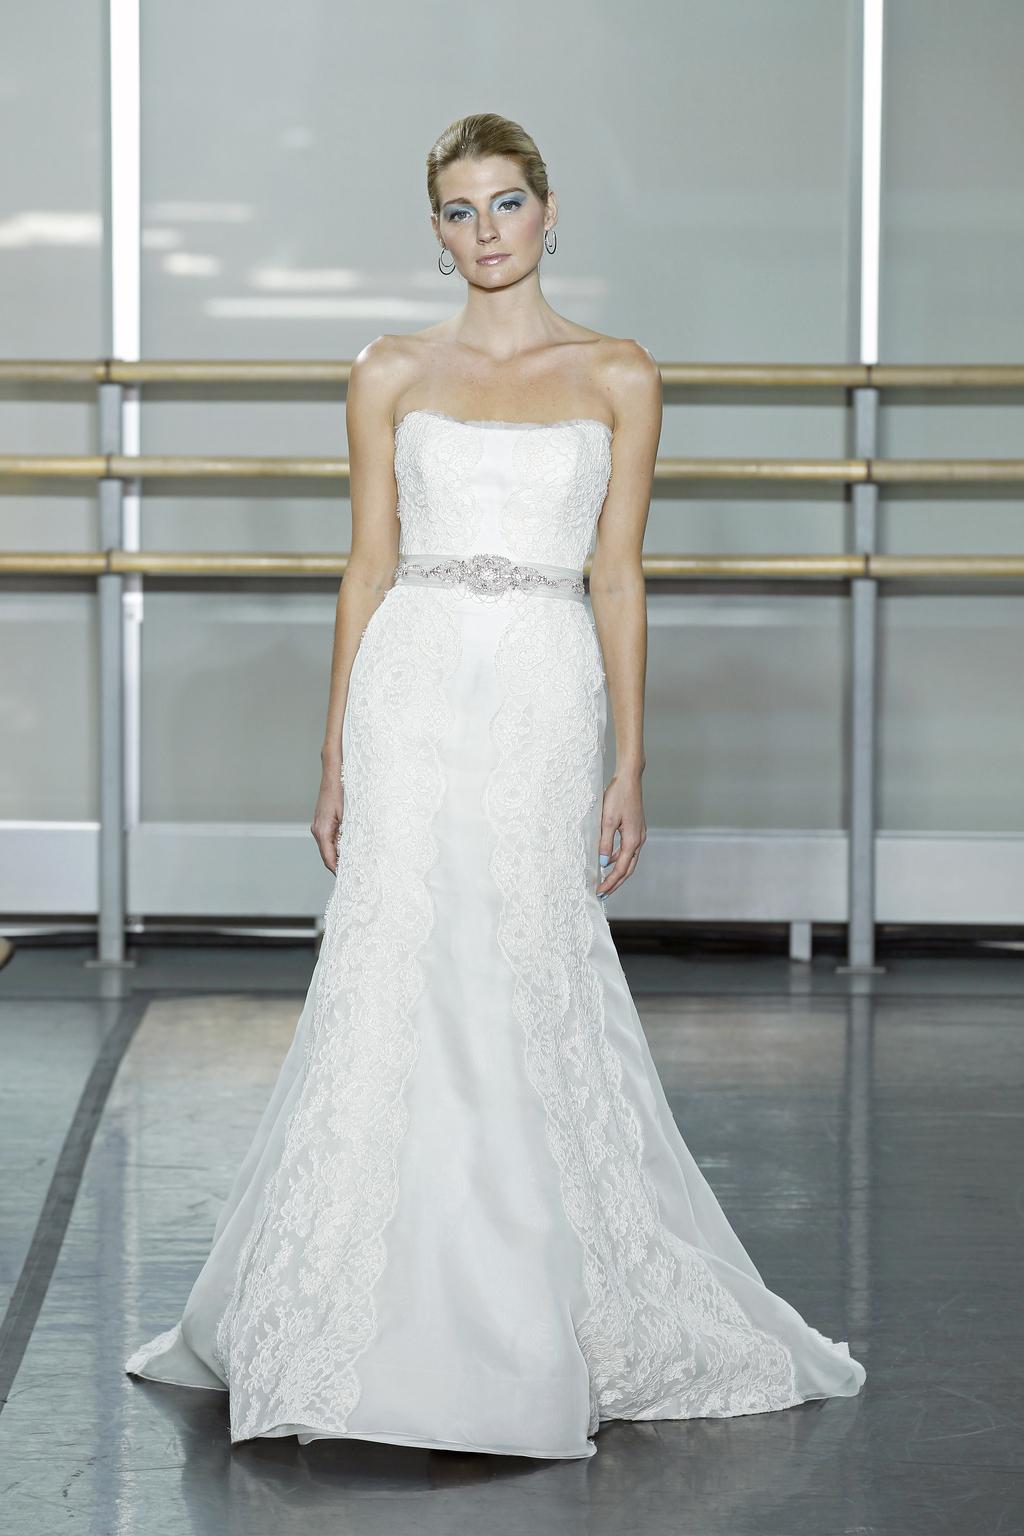 Rivini-wedding-dress-fall-2013-bridal-gown-listra.full